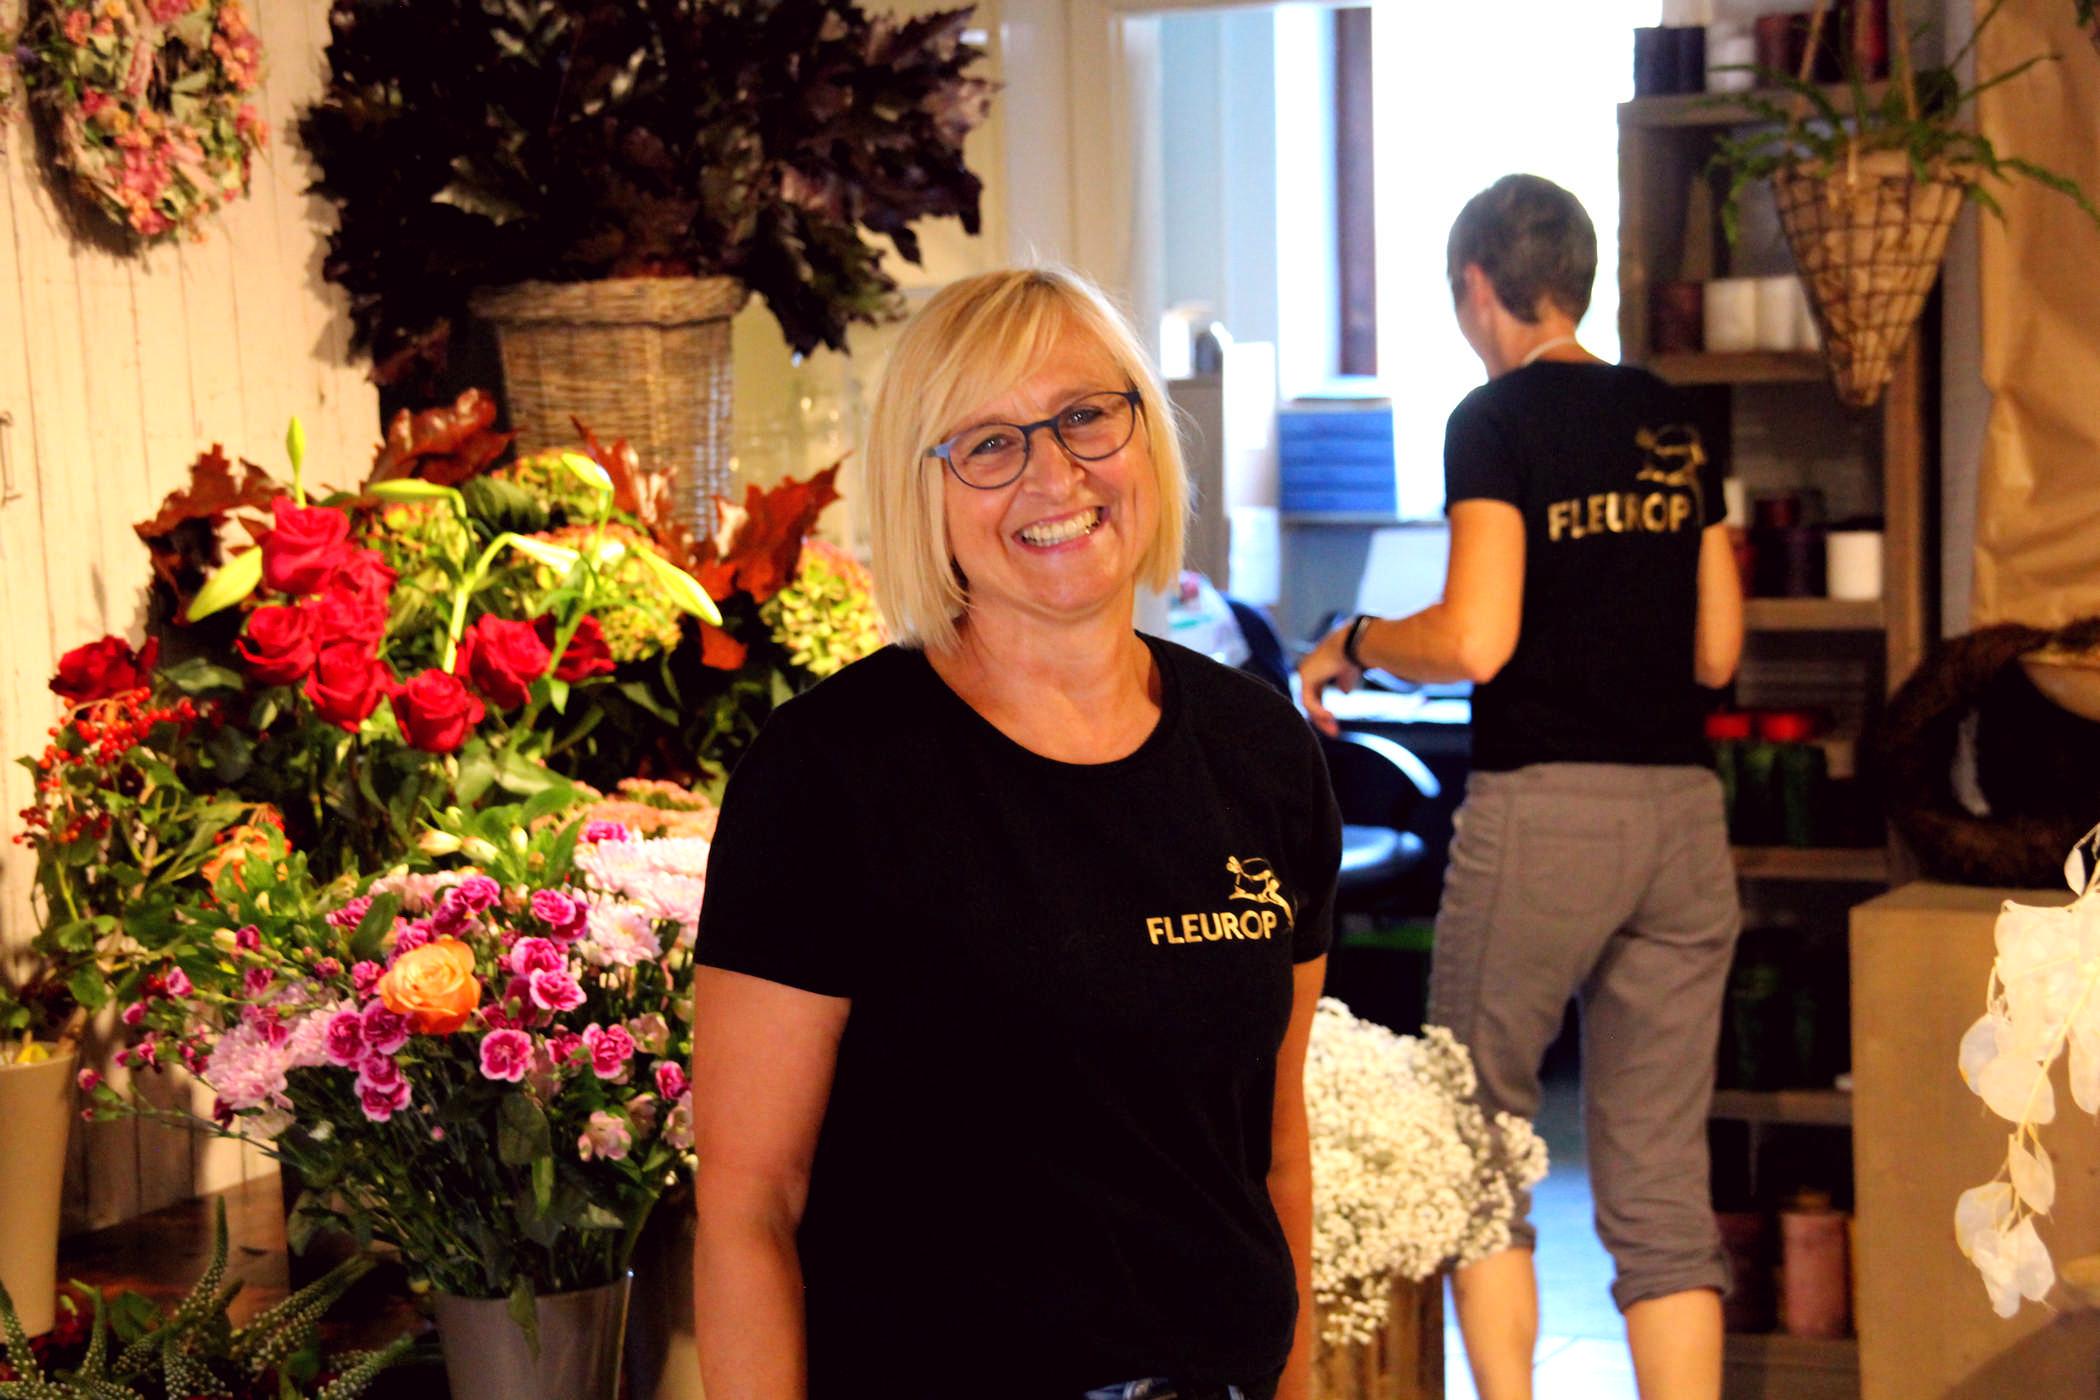 Regina's Blumenladen, Inh. Regina Ramoser, Markt Inderdorf